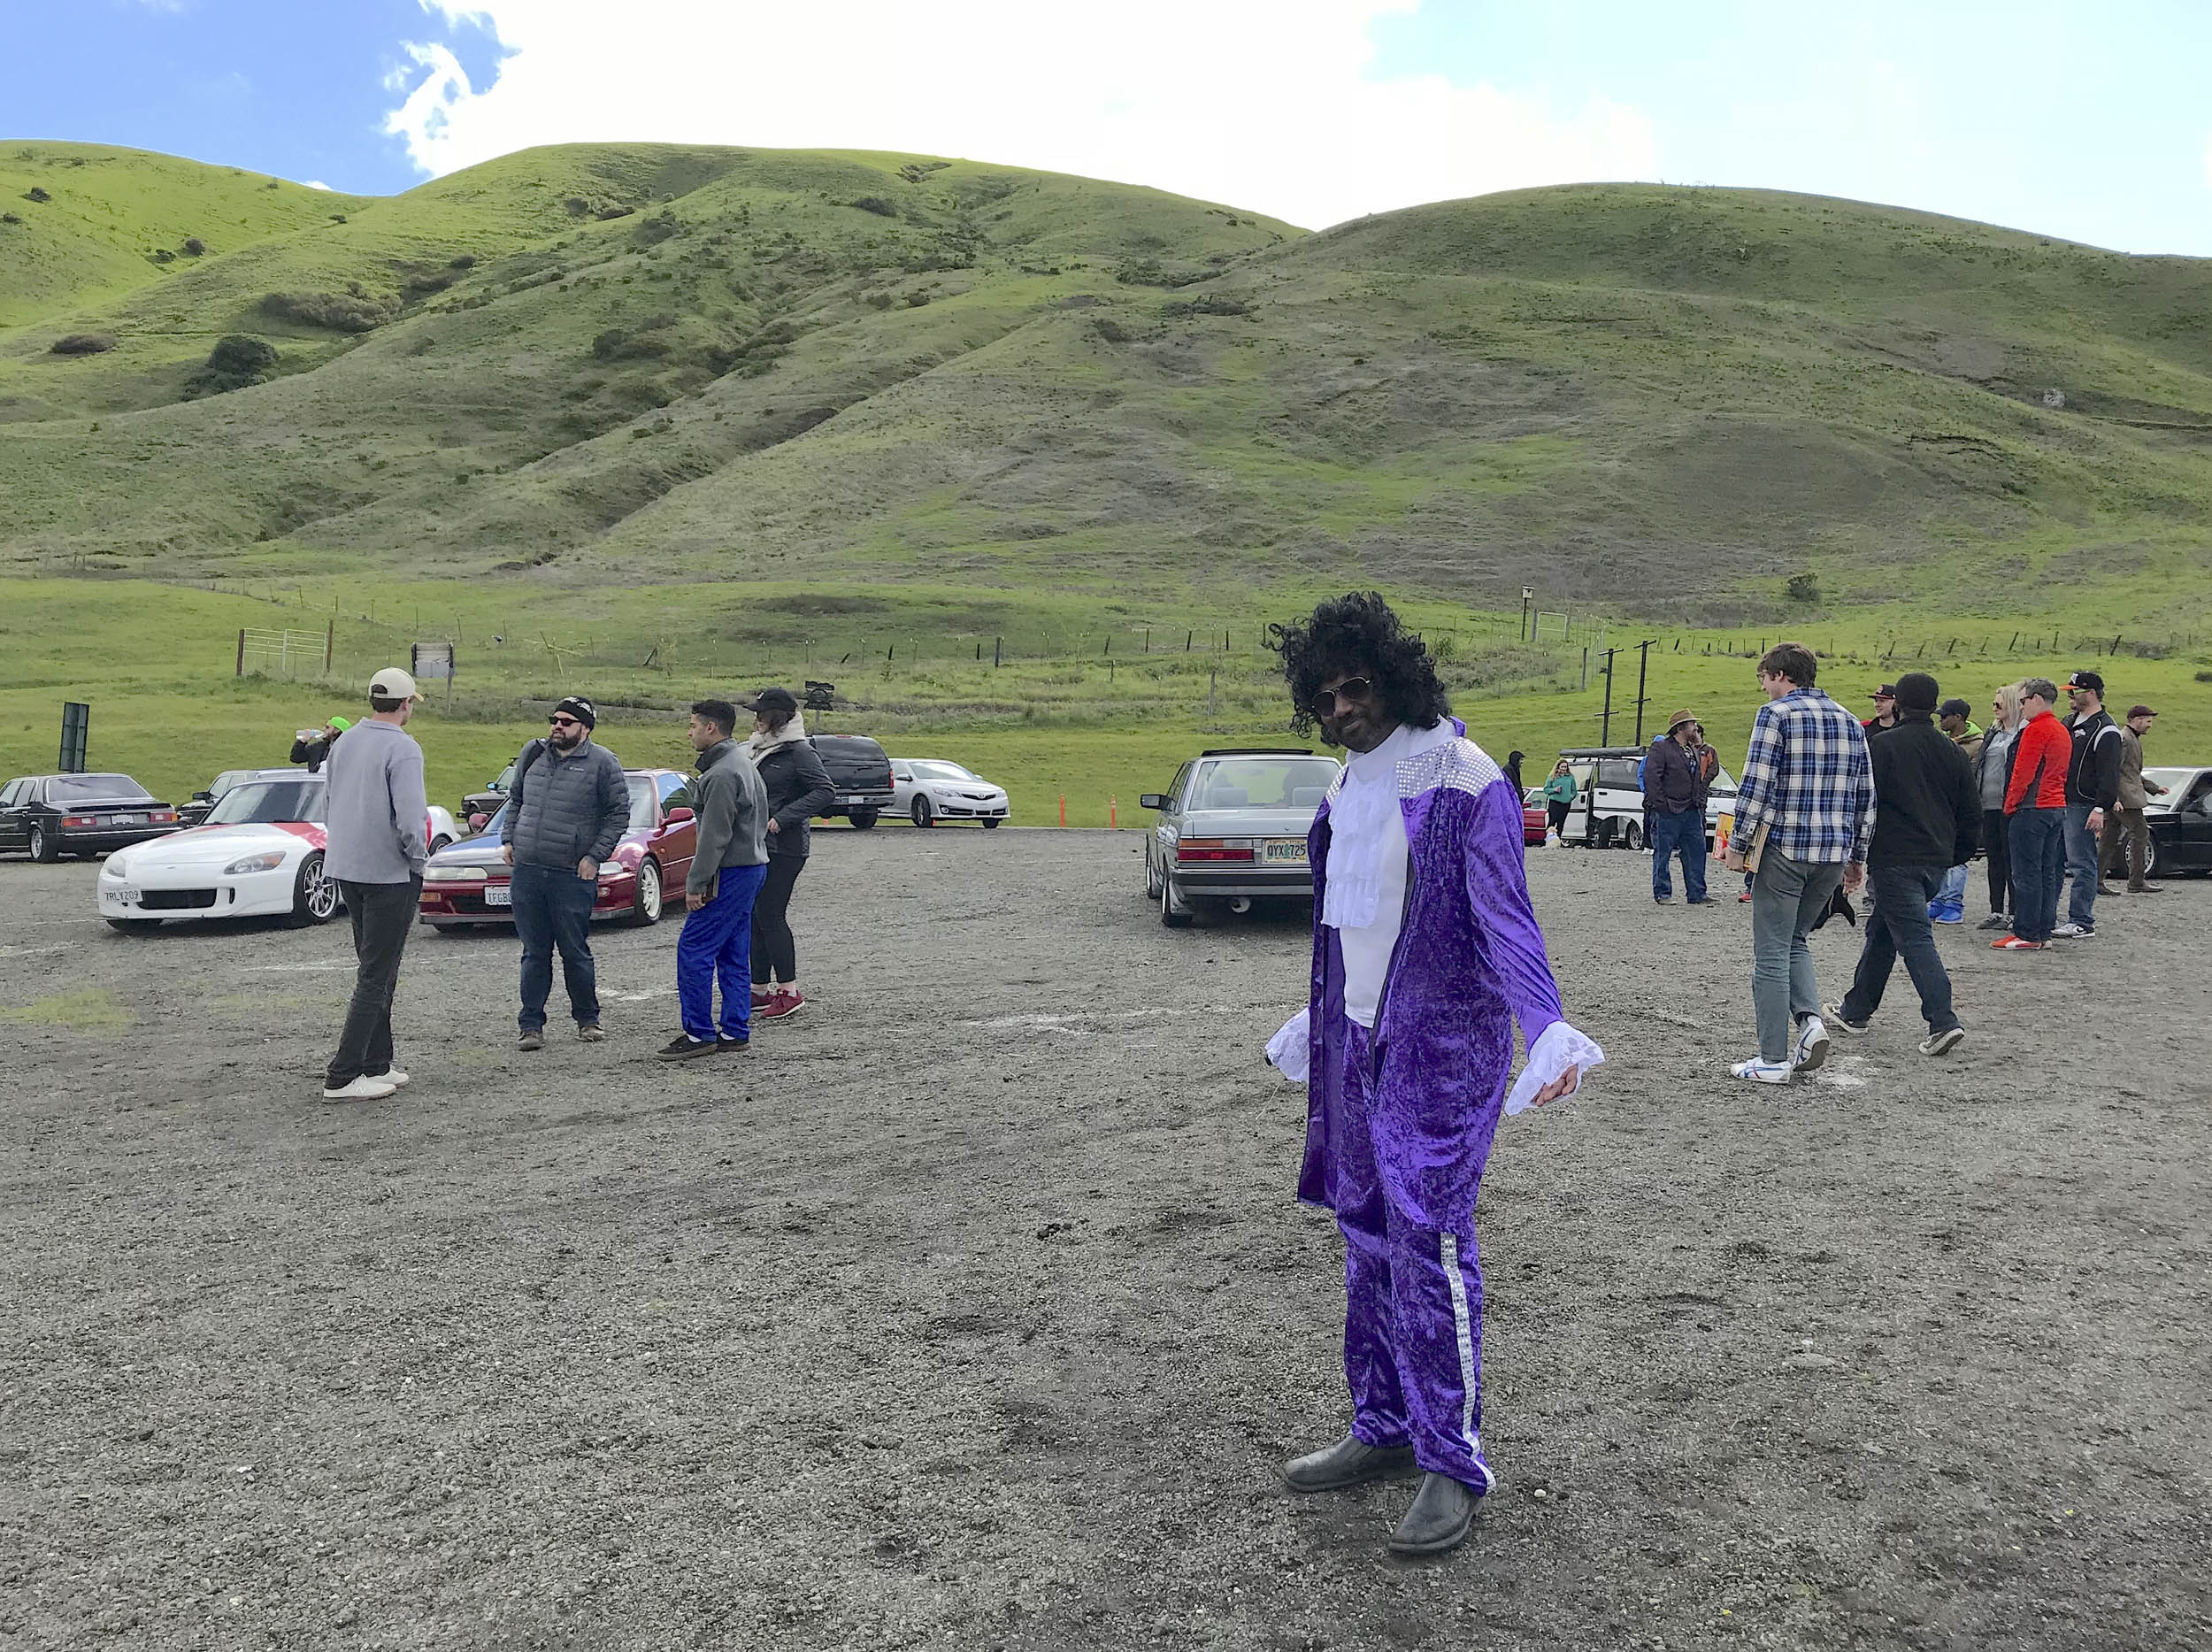 Radwood event goer in costume